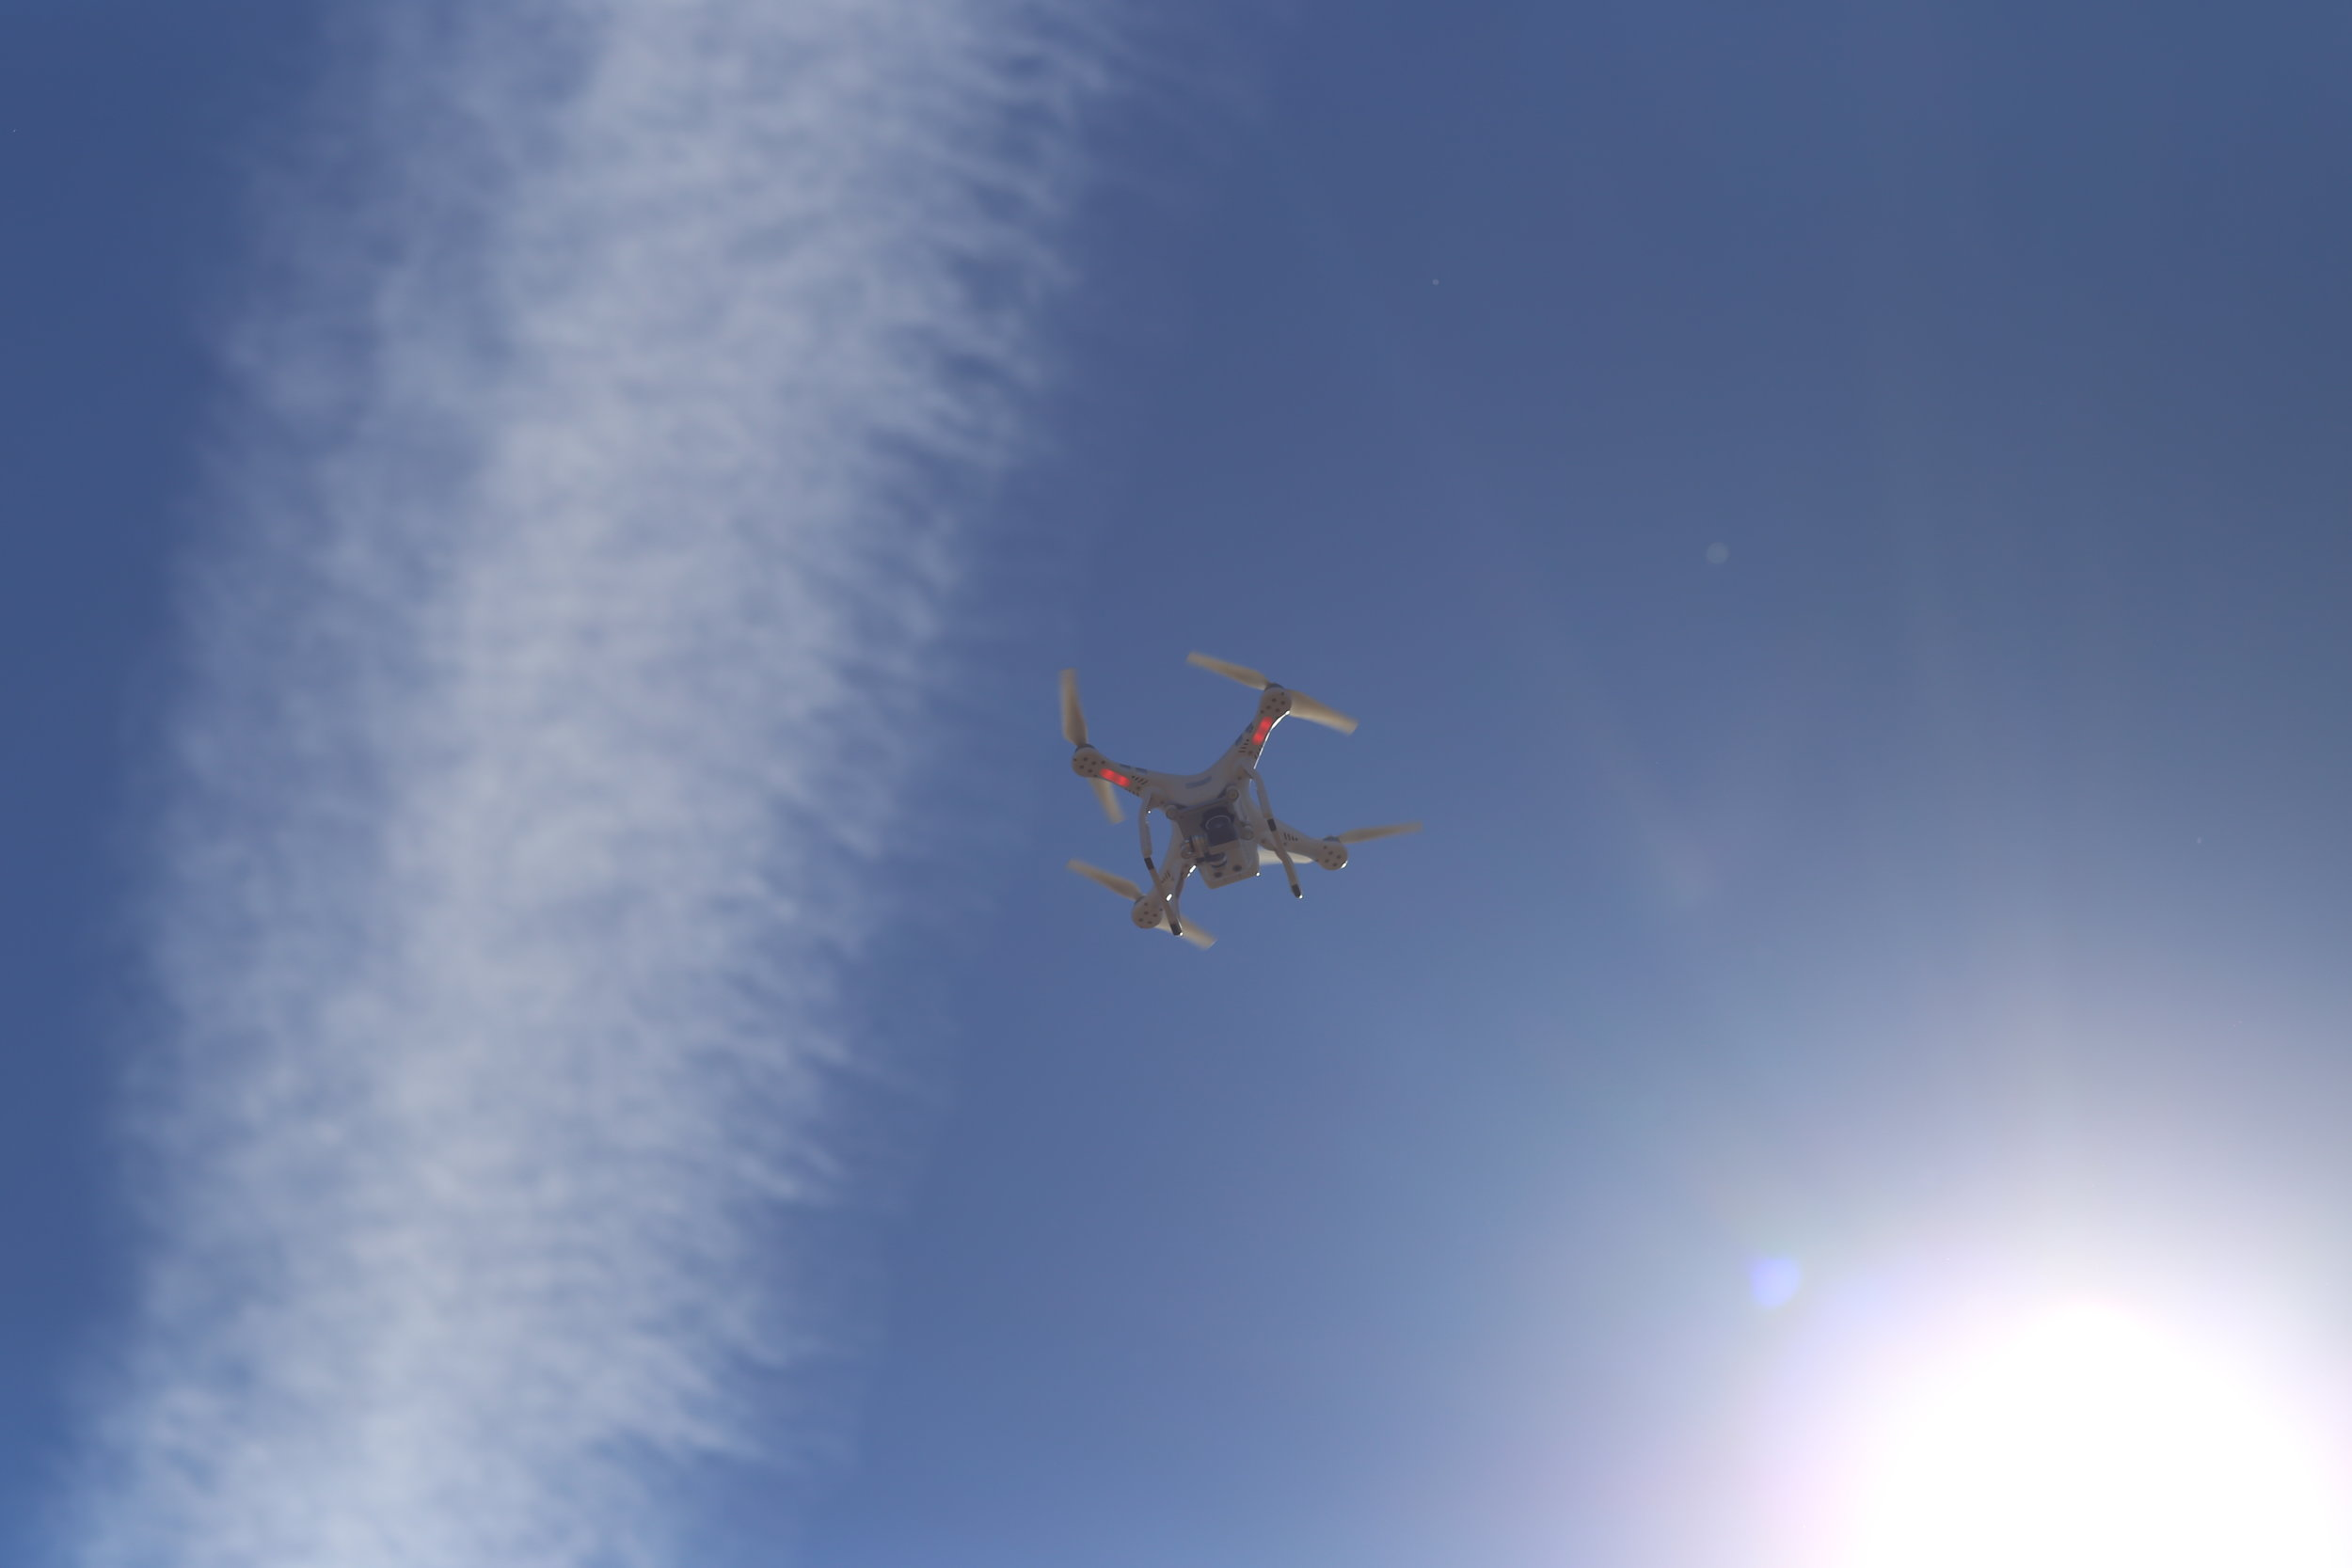 David Merrick's drone goes a-flyin'